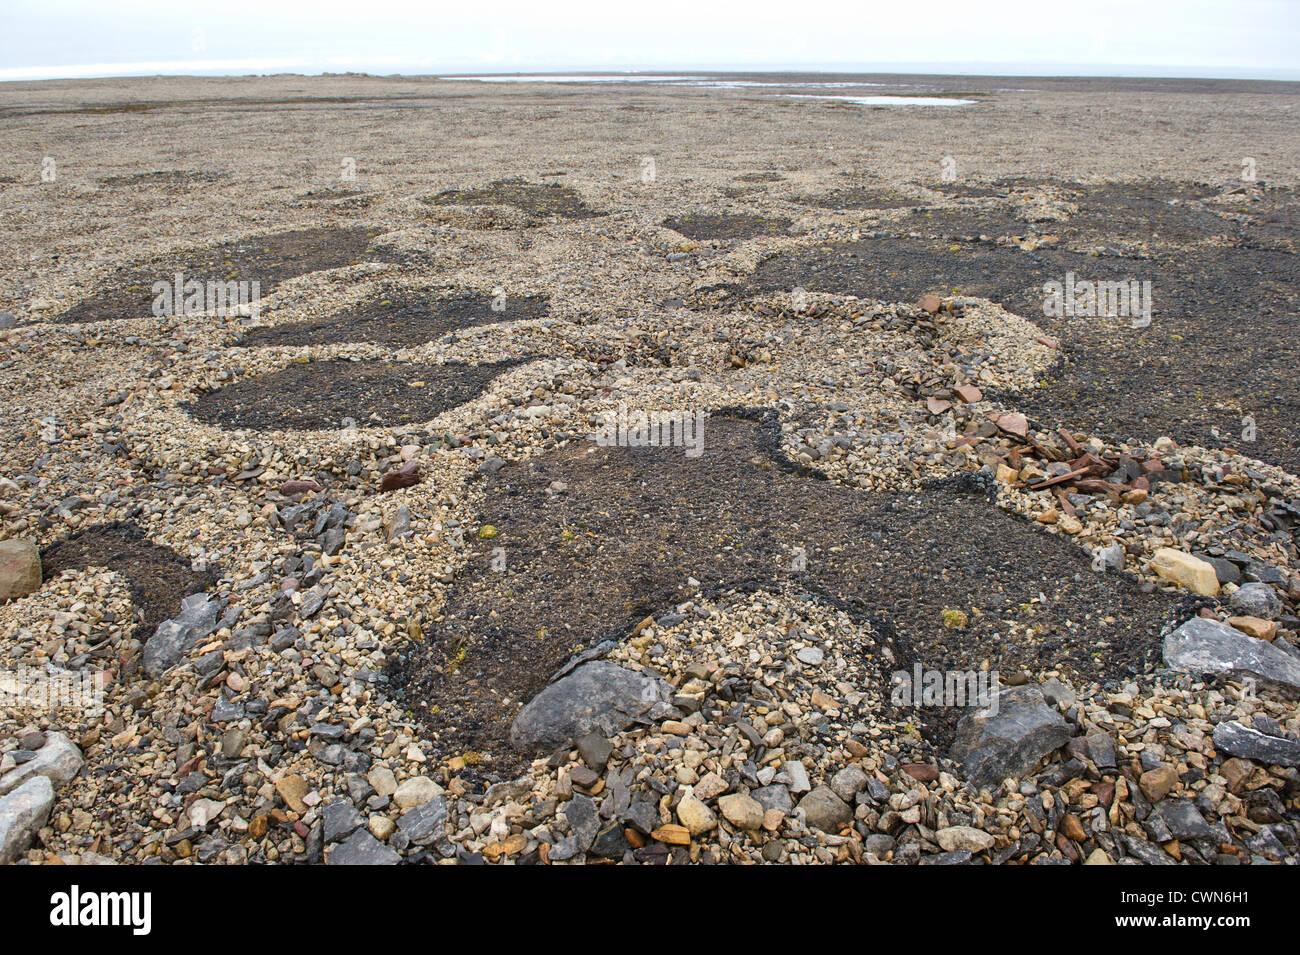 Permafrost soil stone formations, Murchisonfjord, Spitsbergen, Svalbard, Arctic - Stock Image